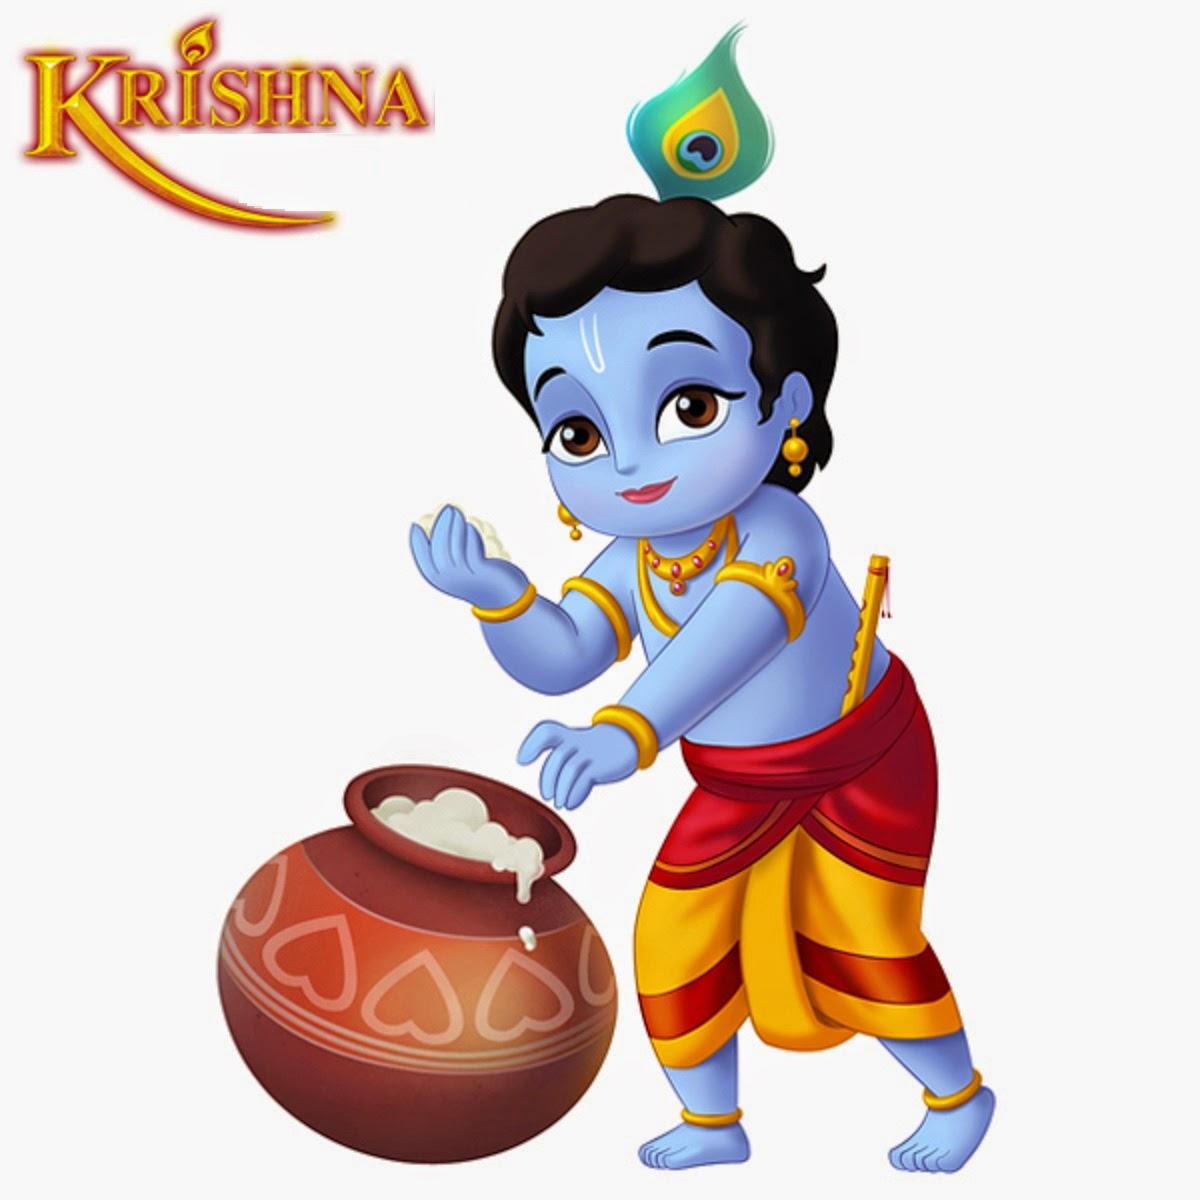 Free Download HD Wallpapers: Little Krishna Free Wallpapers